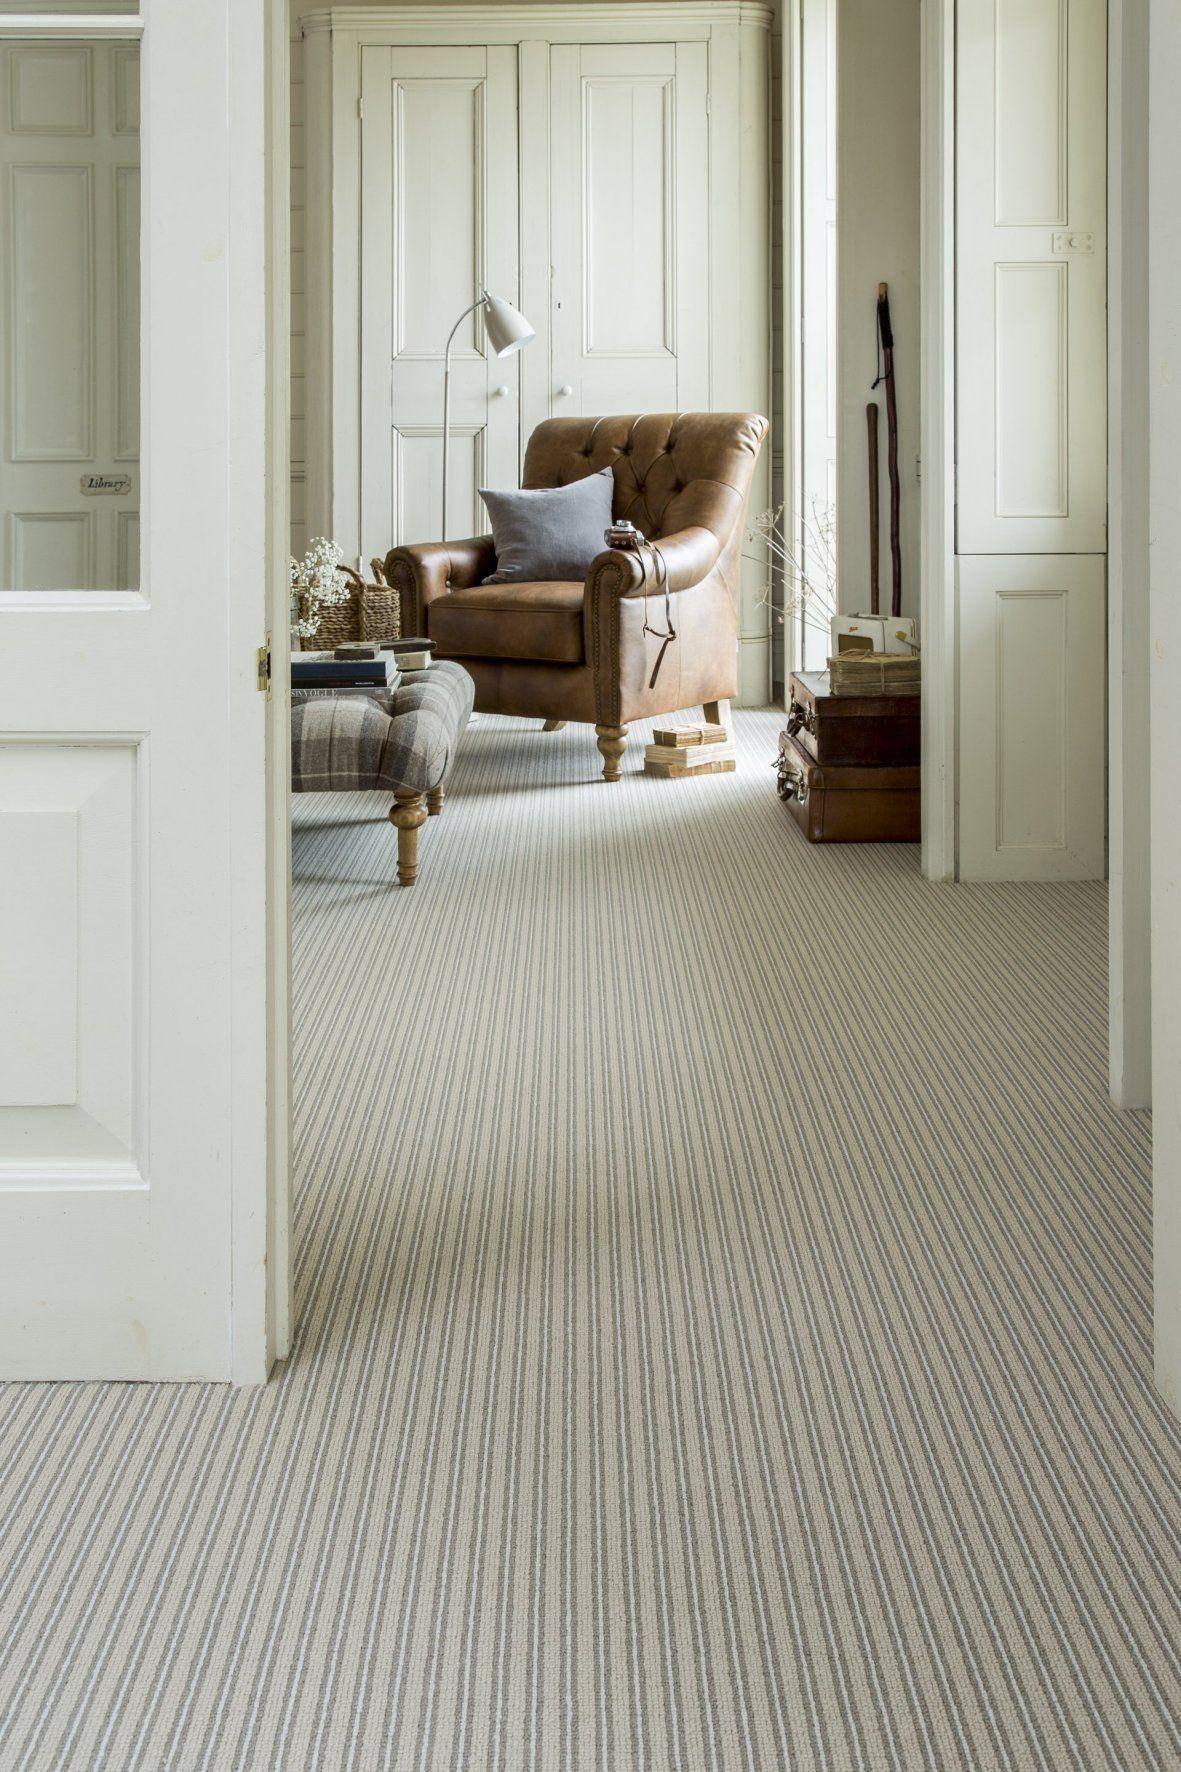 Wool Or Polypropylene Carpet The Pros And Cons Revealed Textured Carpet Beige Carpet Bedroom Polypropylene Carpet